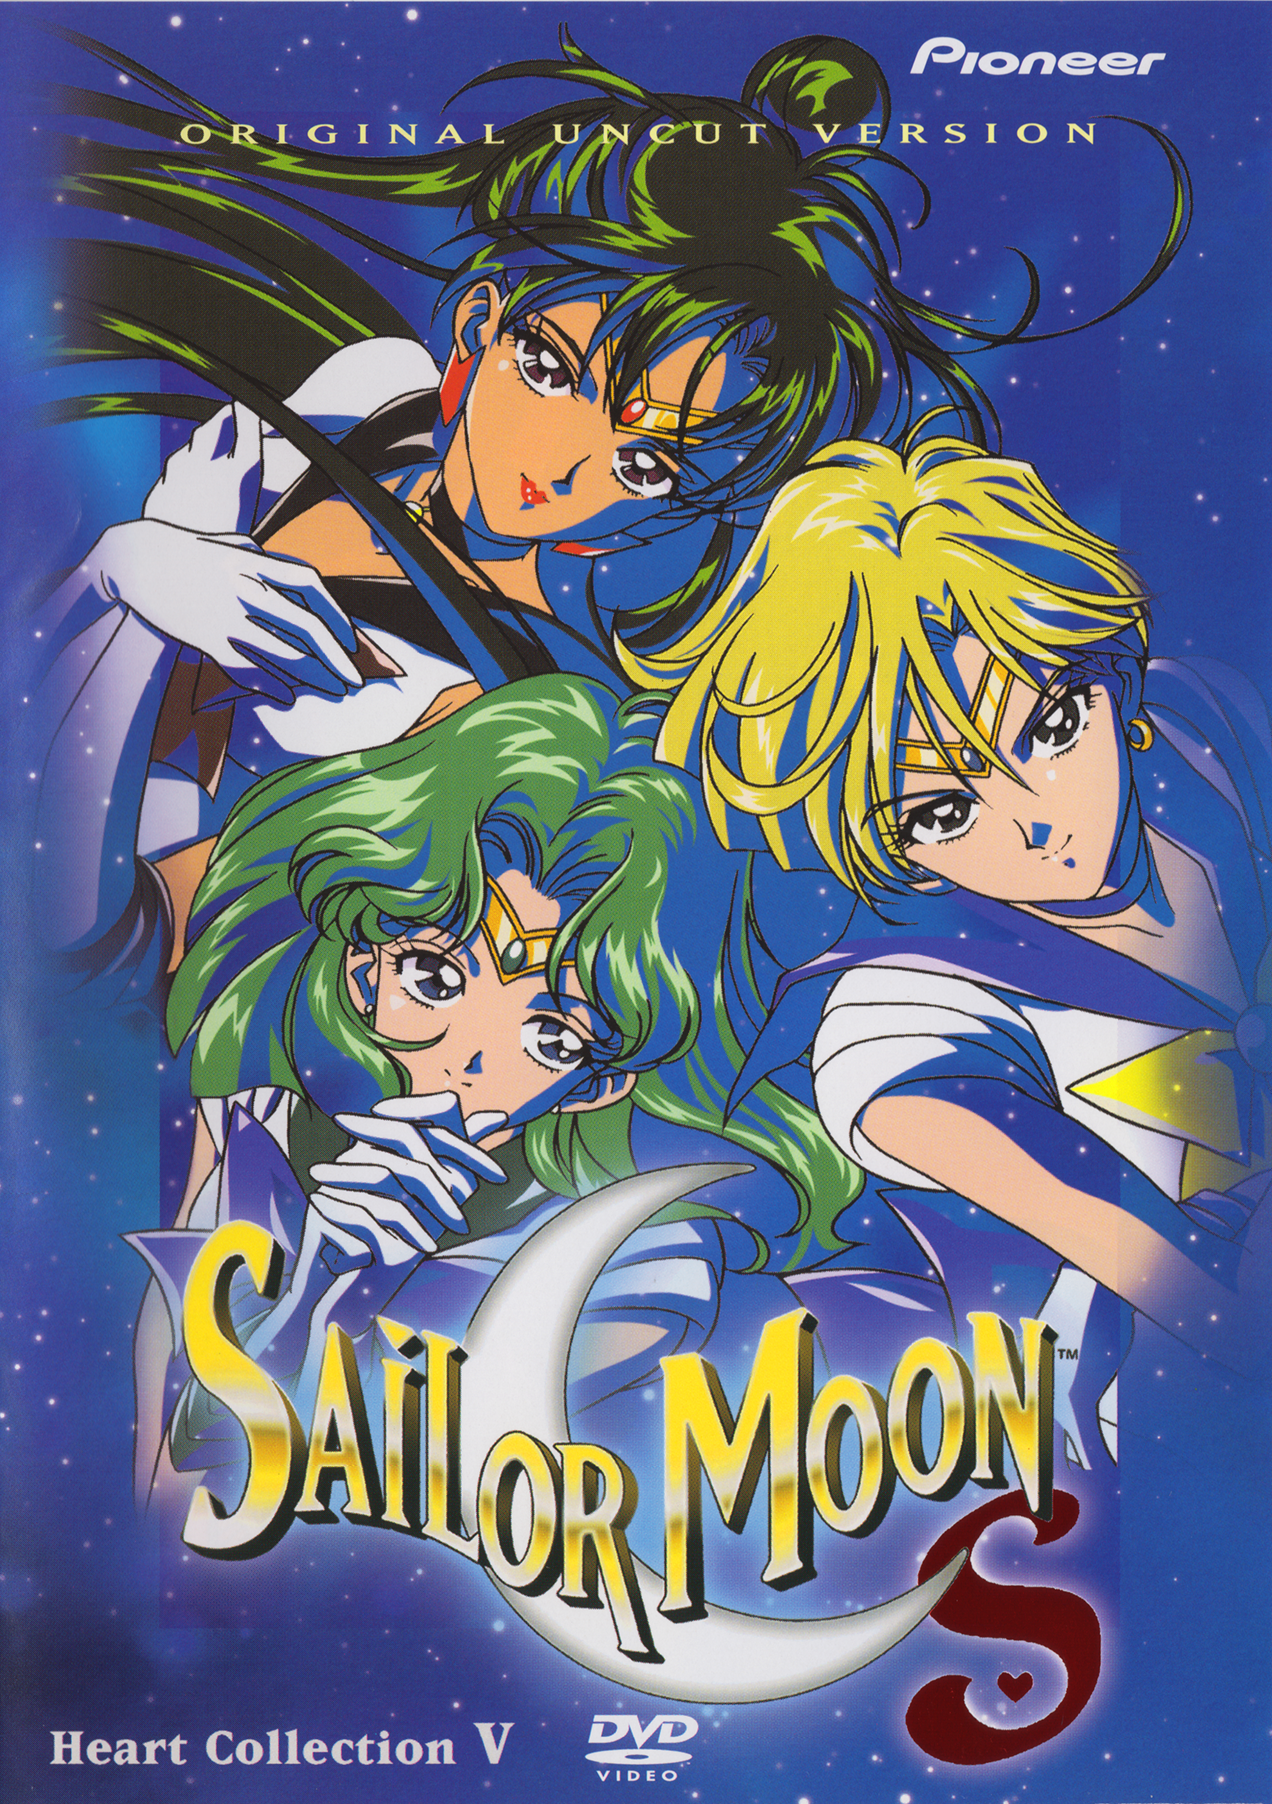 Sailor Moon S - Heart Collection V